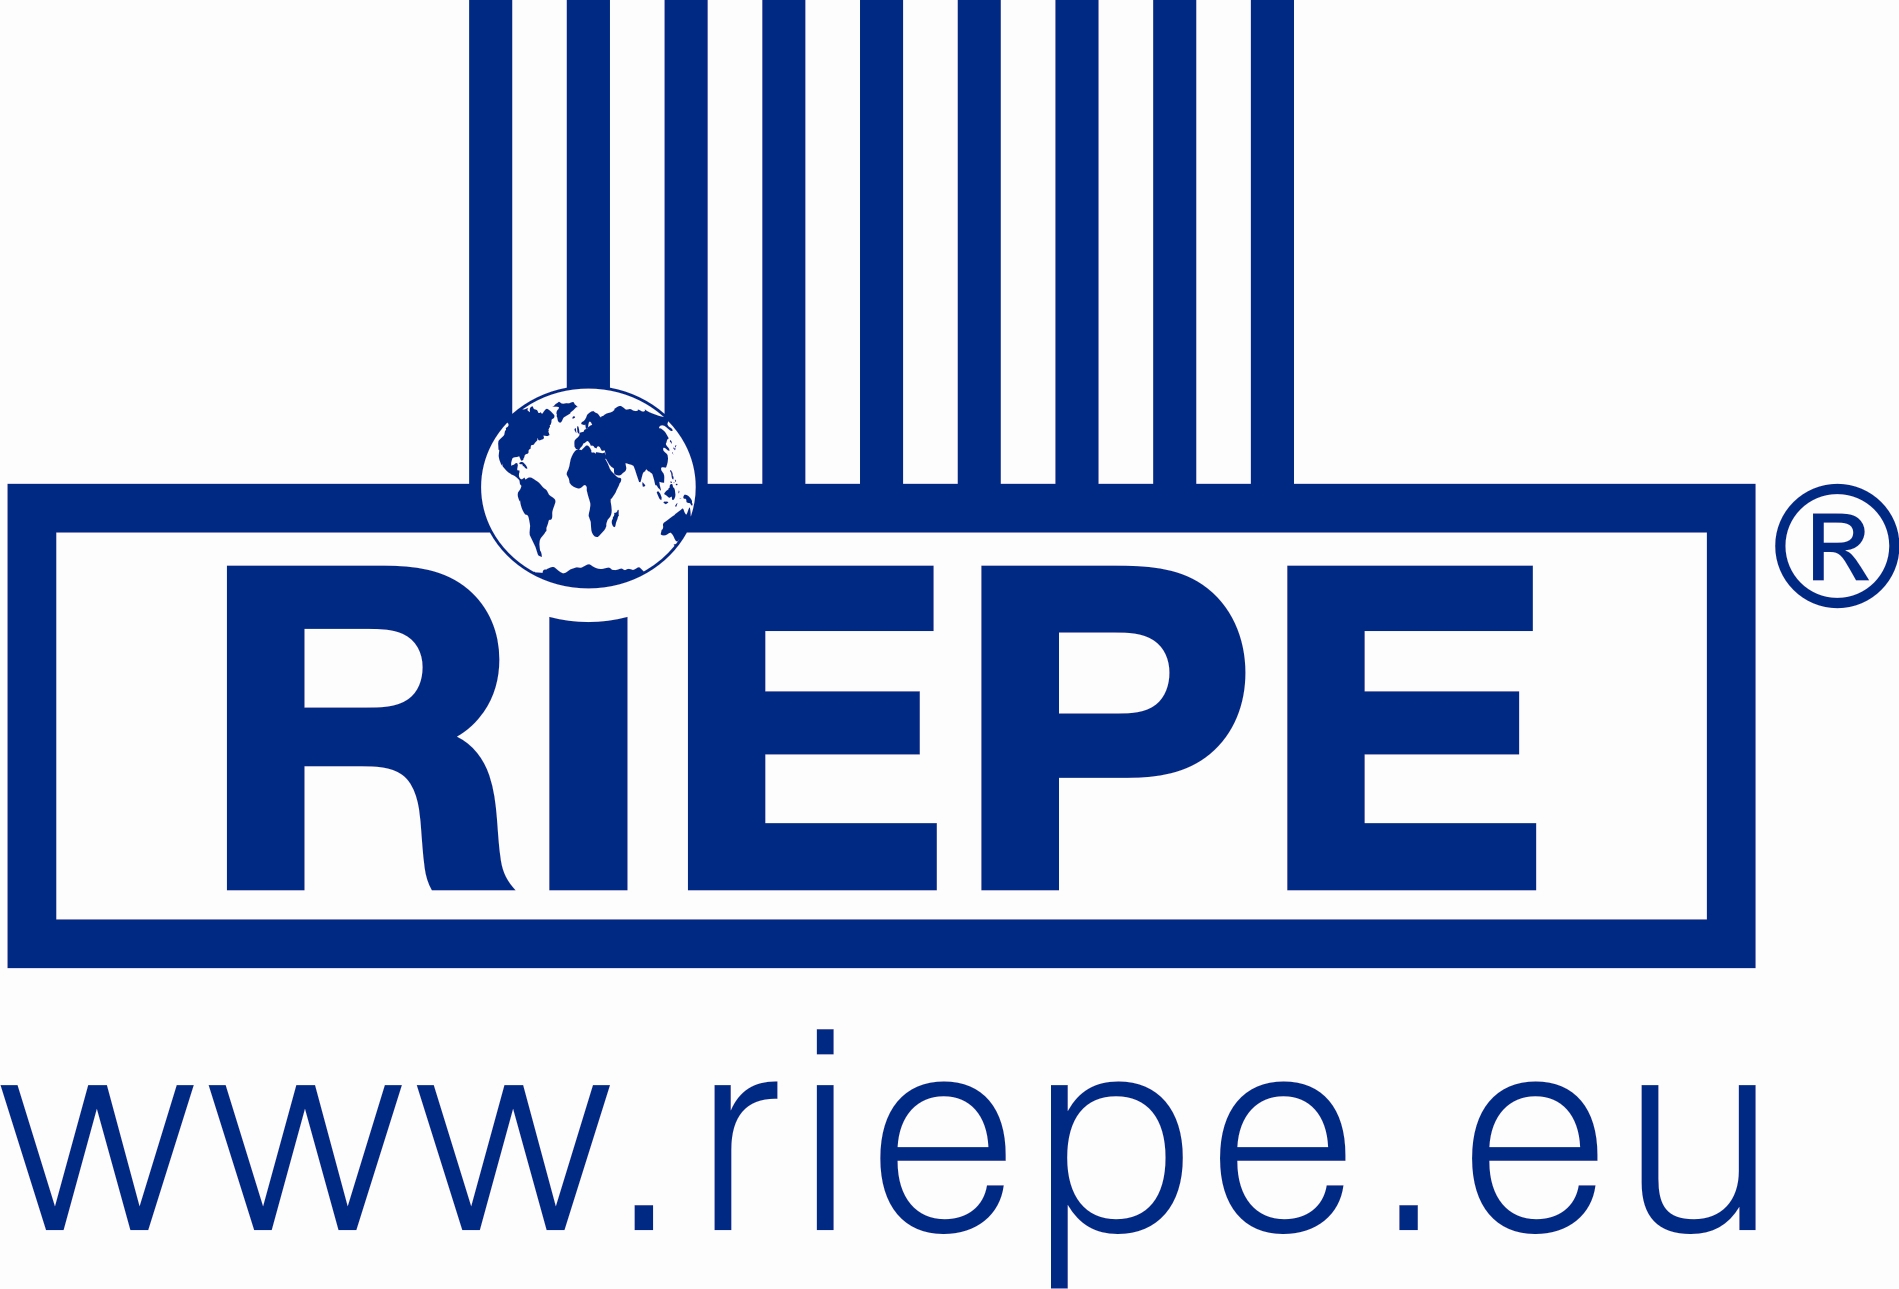 RIEPE GmbH & Co. KG